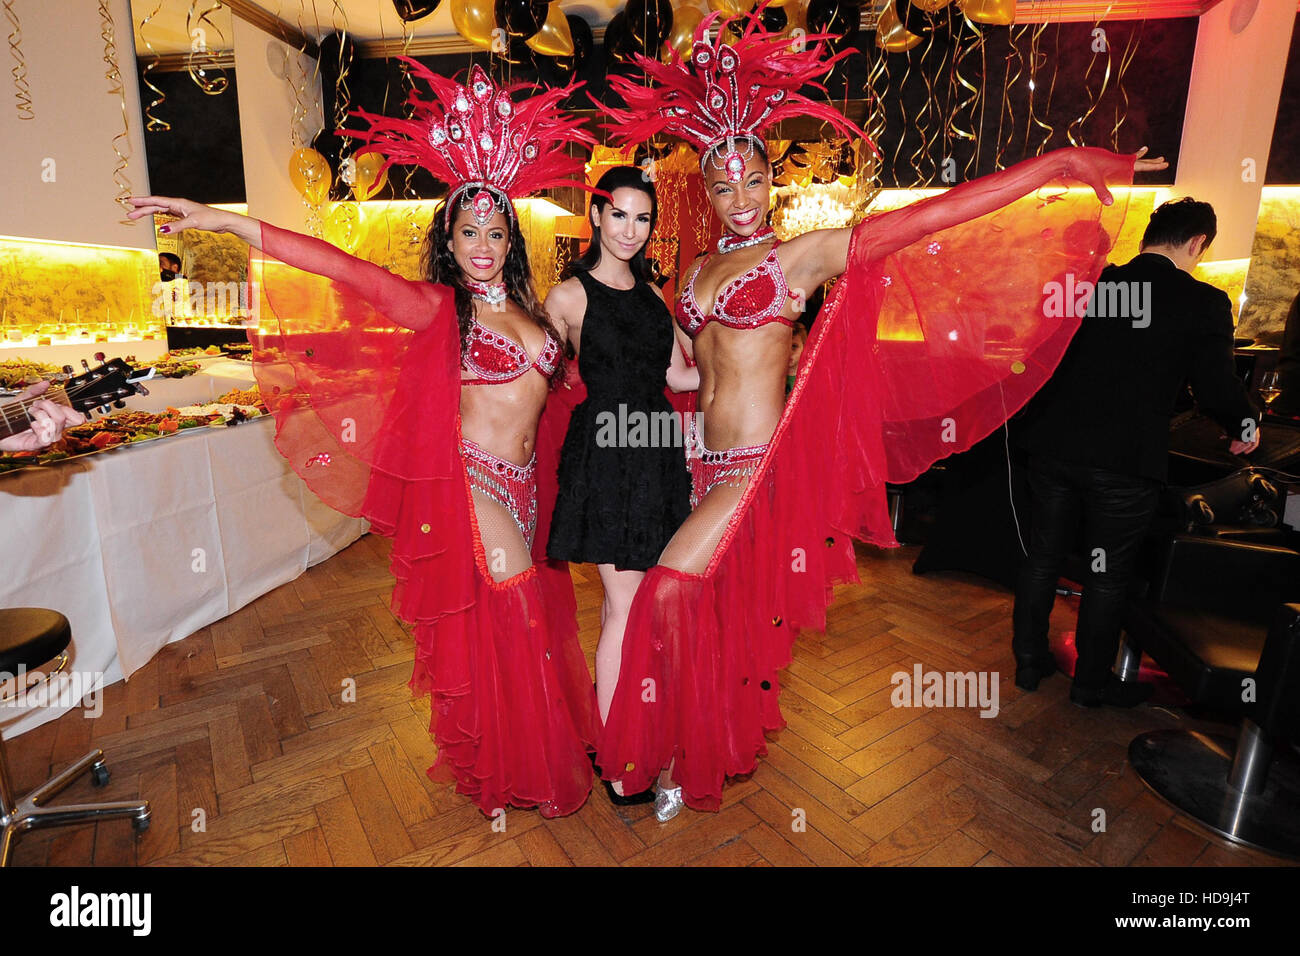 1st anniversary party kokosh hair & beauty salon featuring: sila